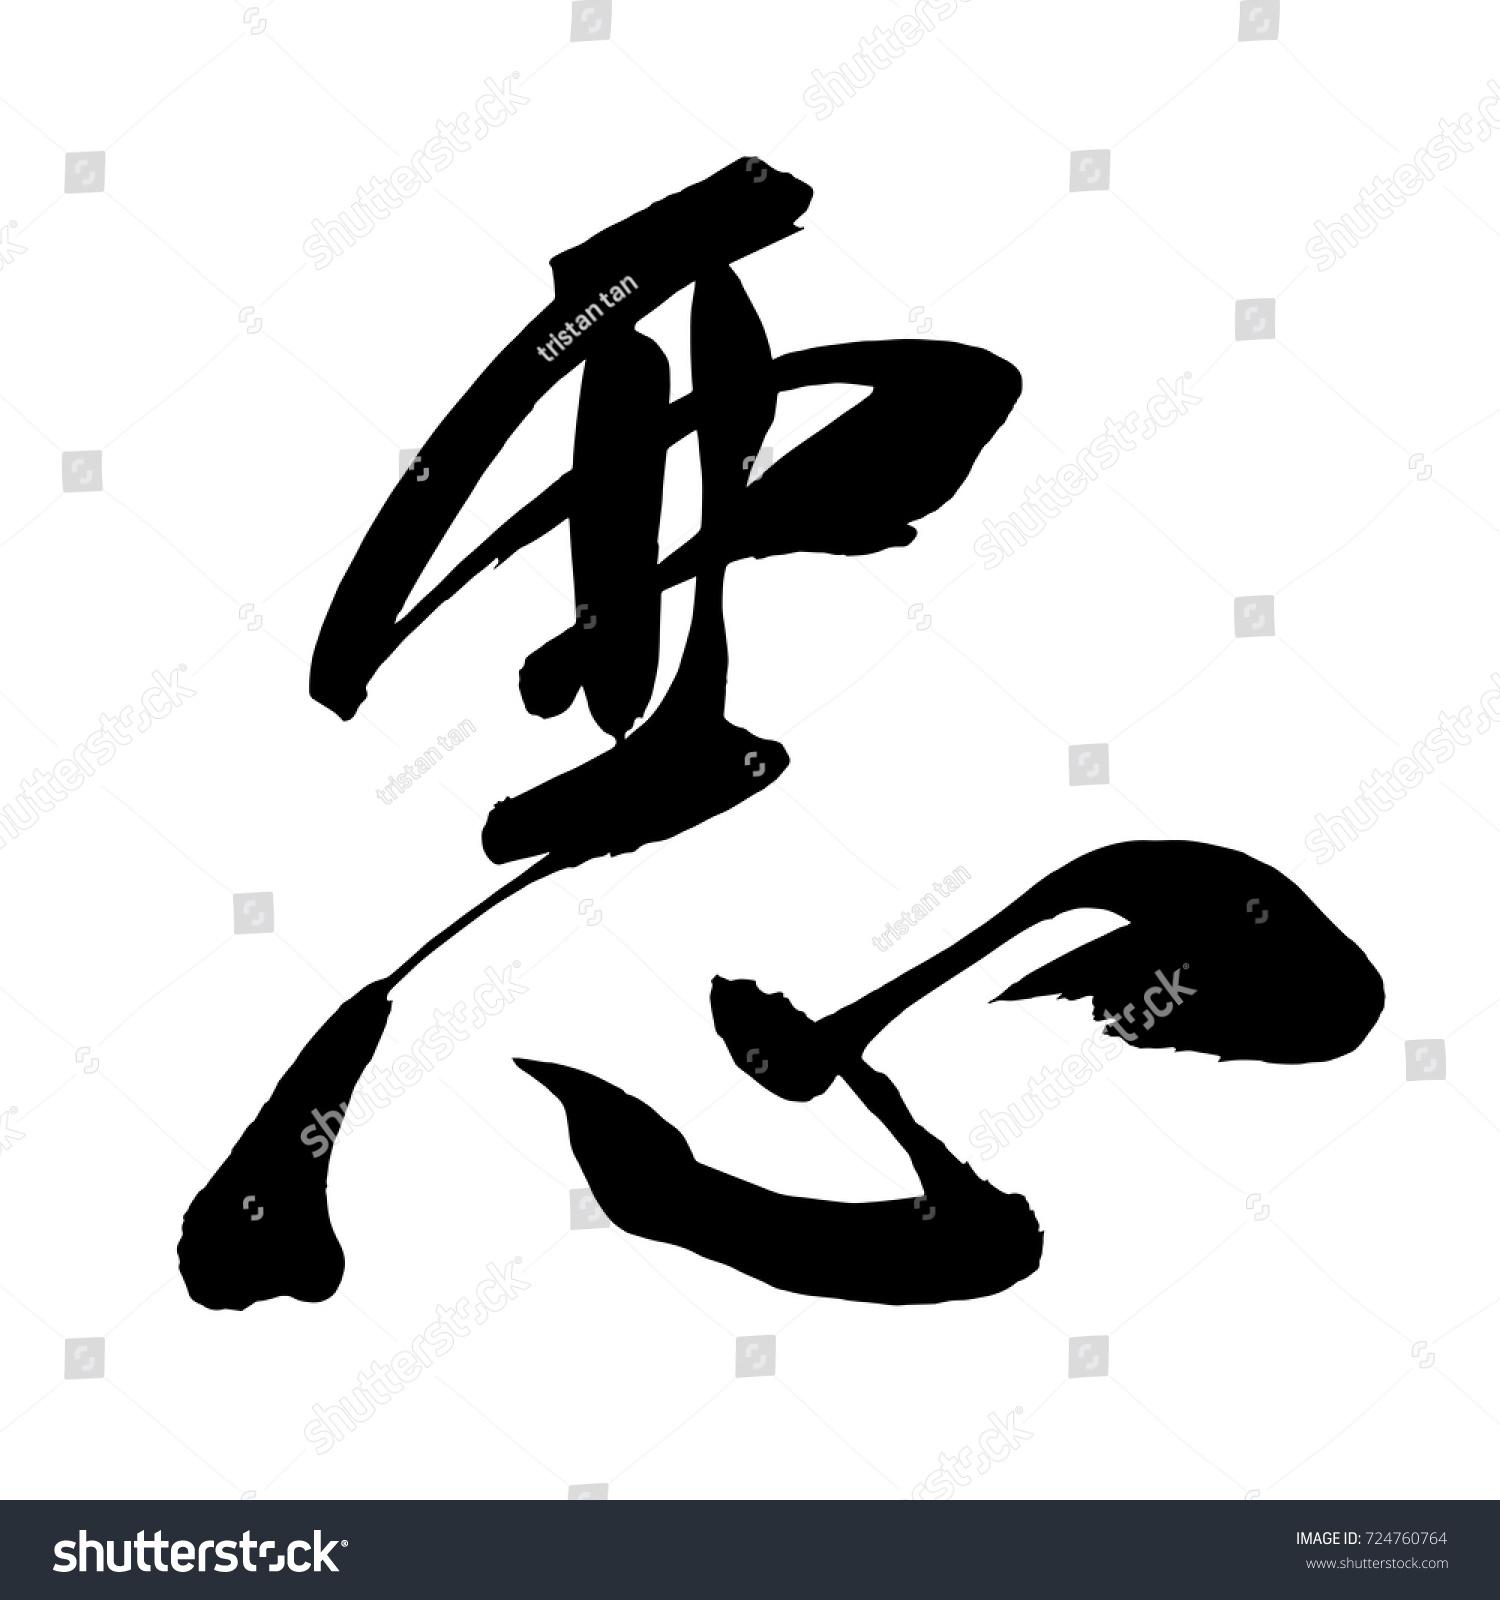 Chinese Calligraphy Translation Hate Loathe Ashamed Stock Vector